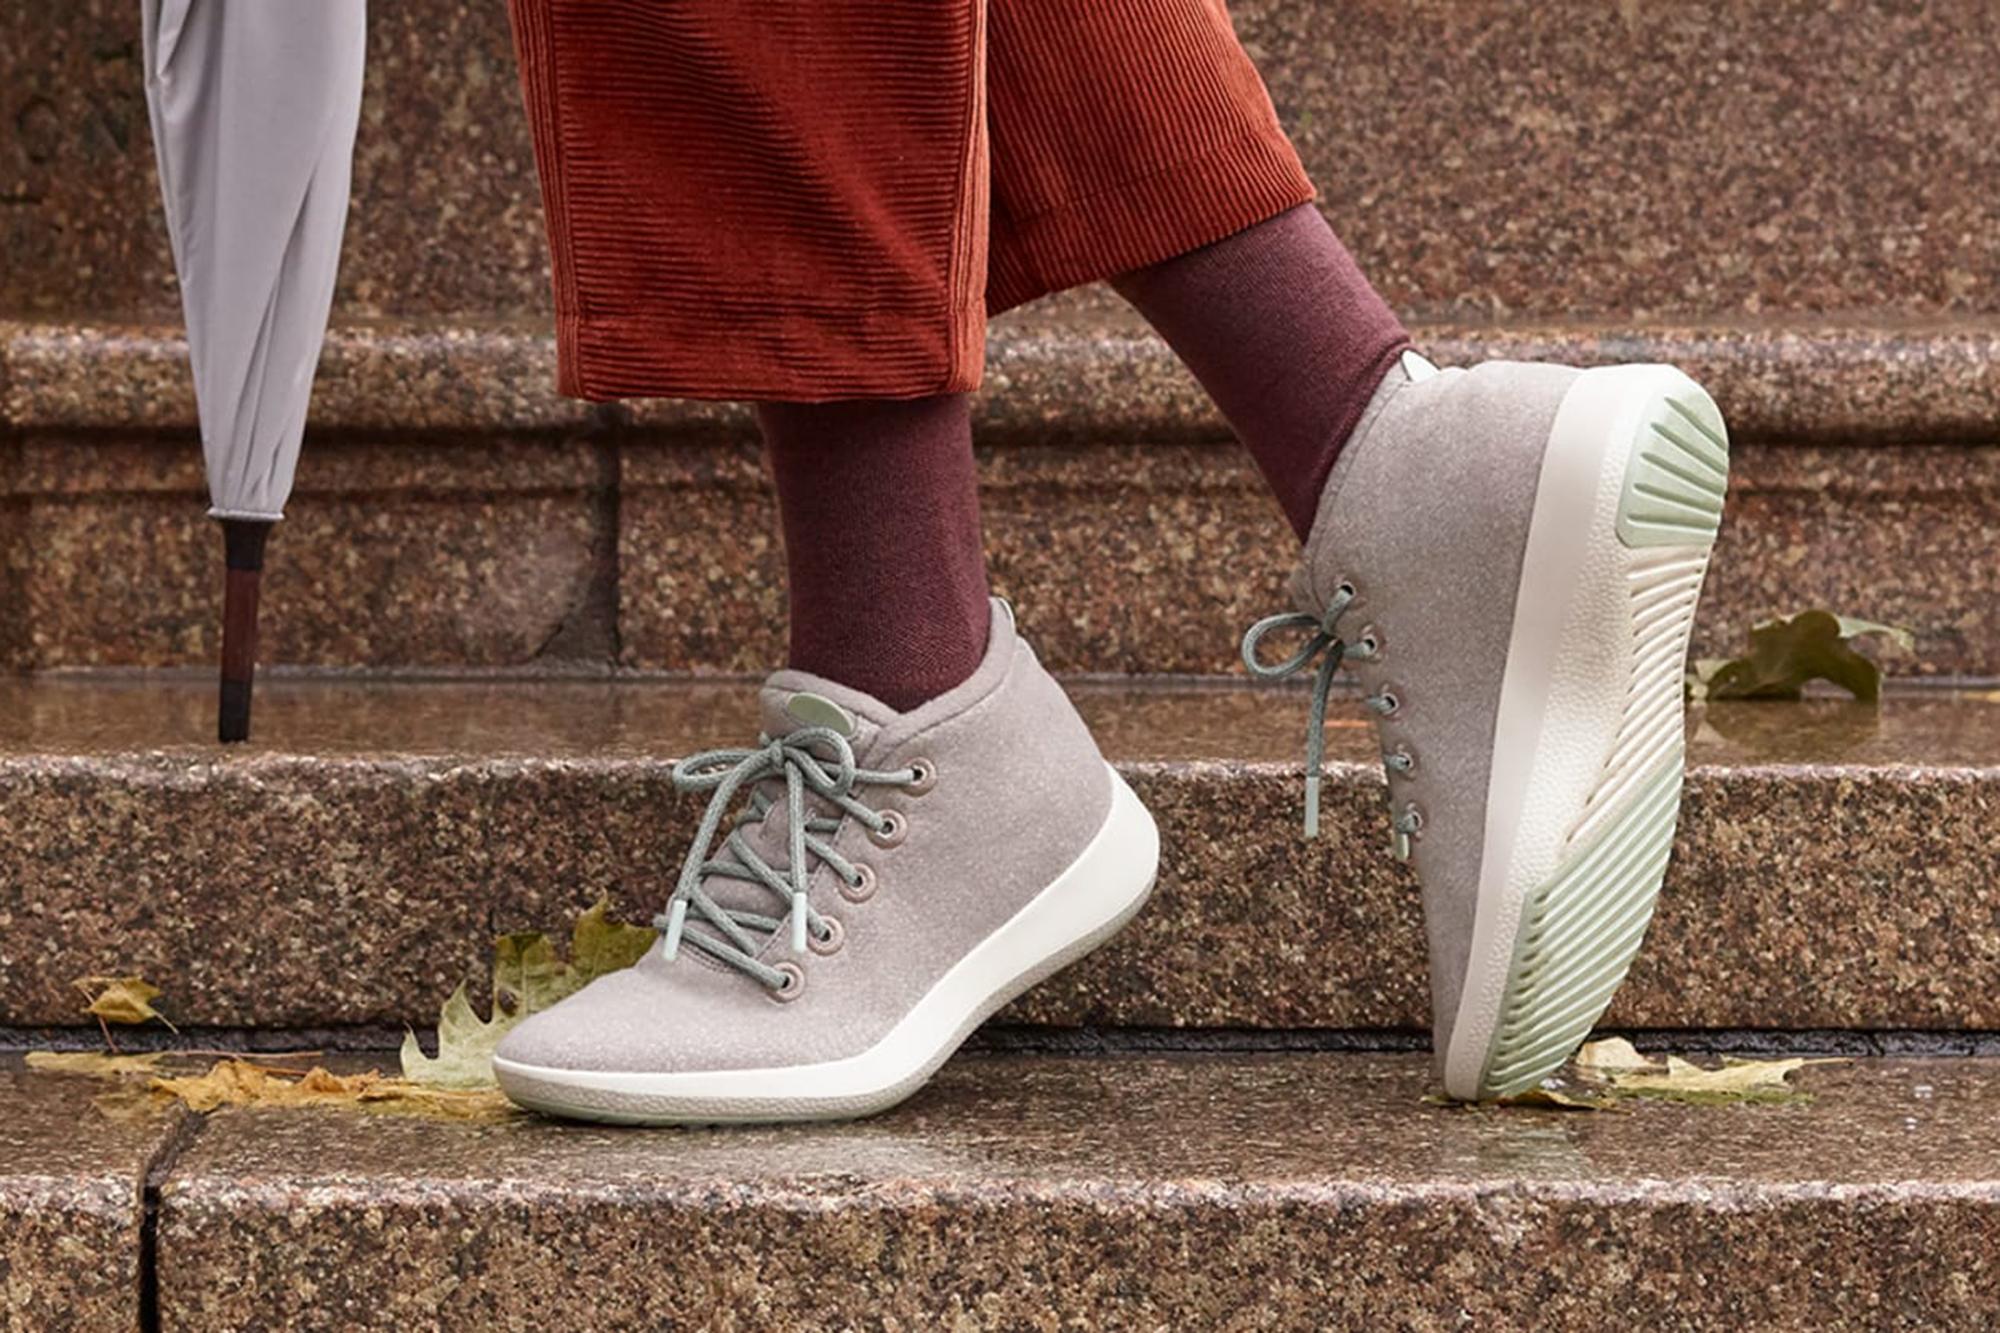 Allbirds Mizzle Sneakers: The Brand's